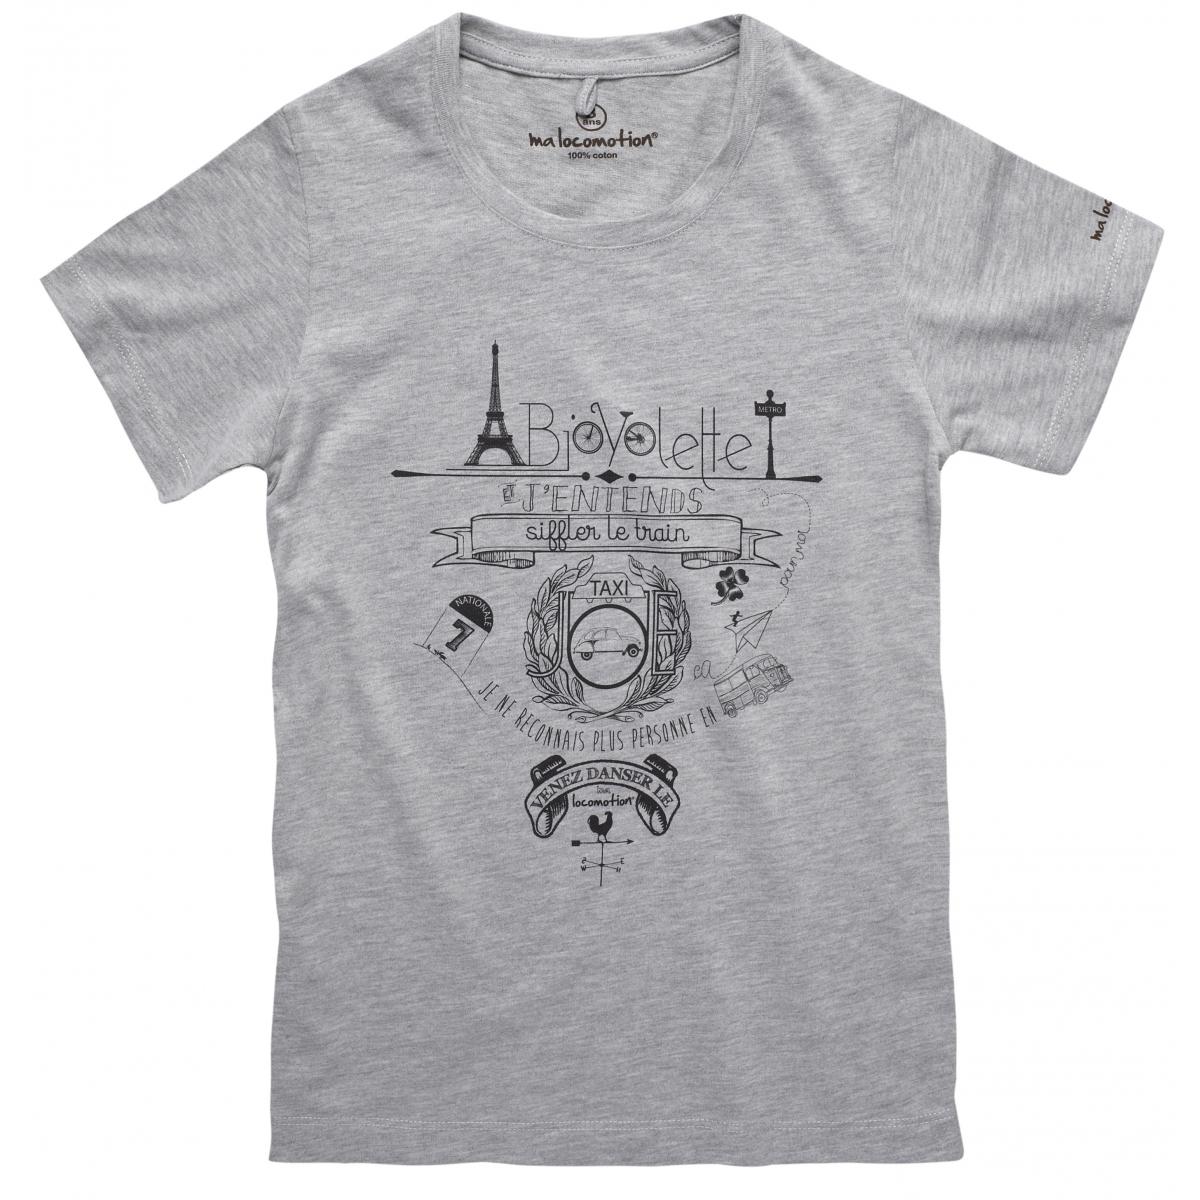 Sweet France t-shirt